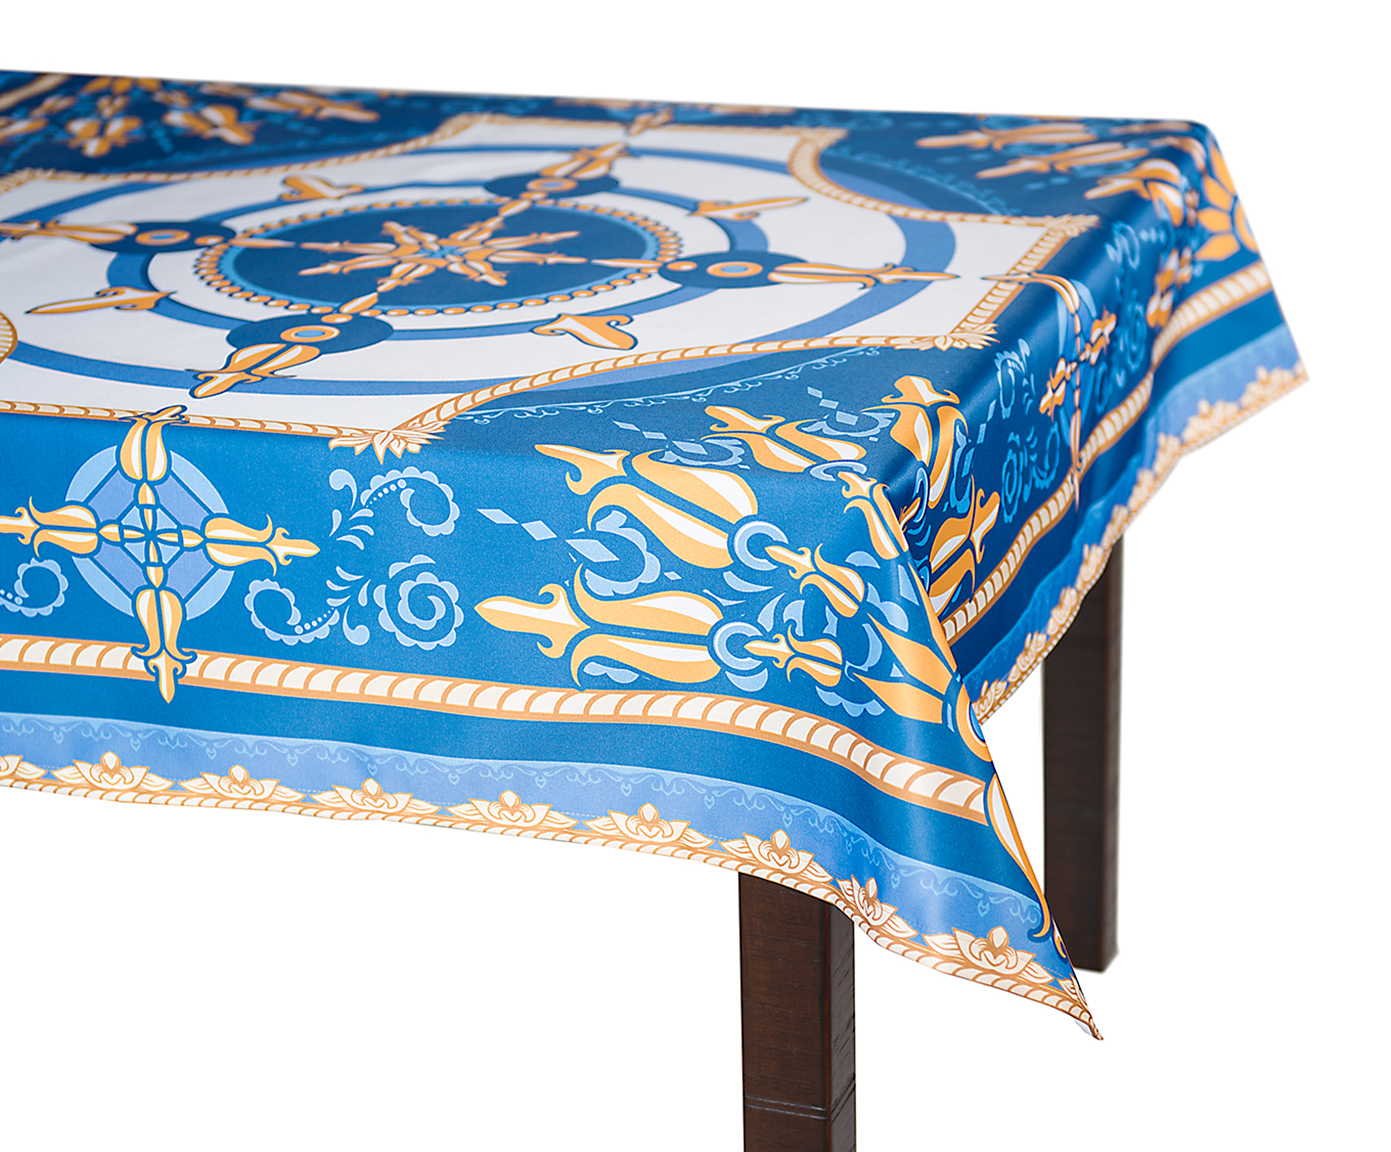 Кухня Скатерть 140x180 Blonder Home Raymond синяя skatert-140x180-blonder-home-raymond-sinyaya-ssha-rossiya.jpg